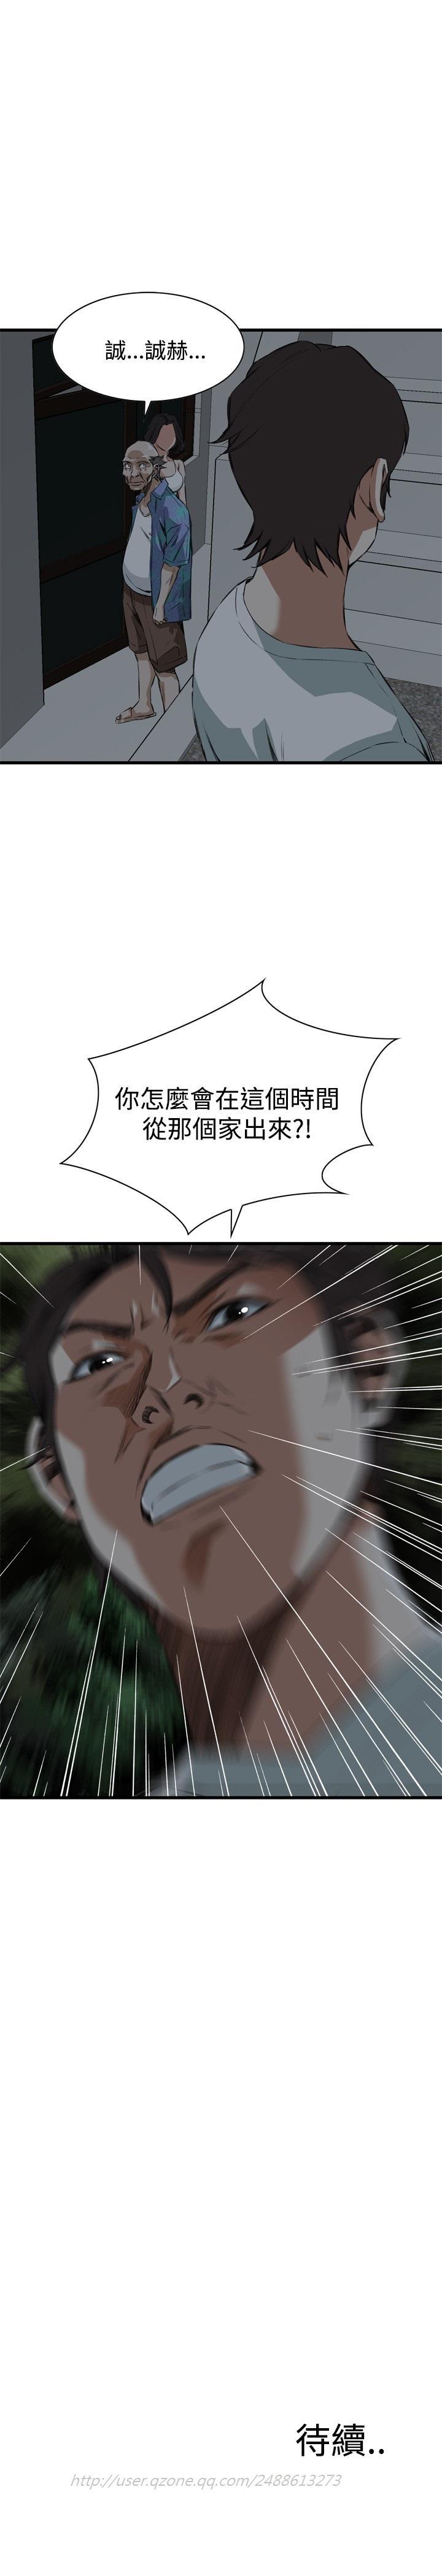 Take a Peek 偷窥 Ch.39~51 [Chinese]中文 205